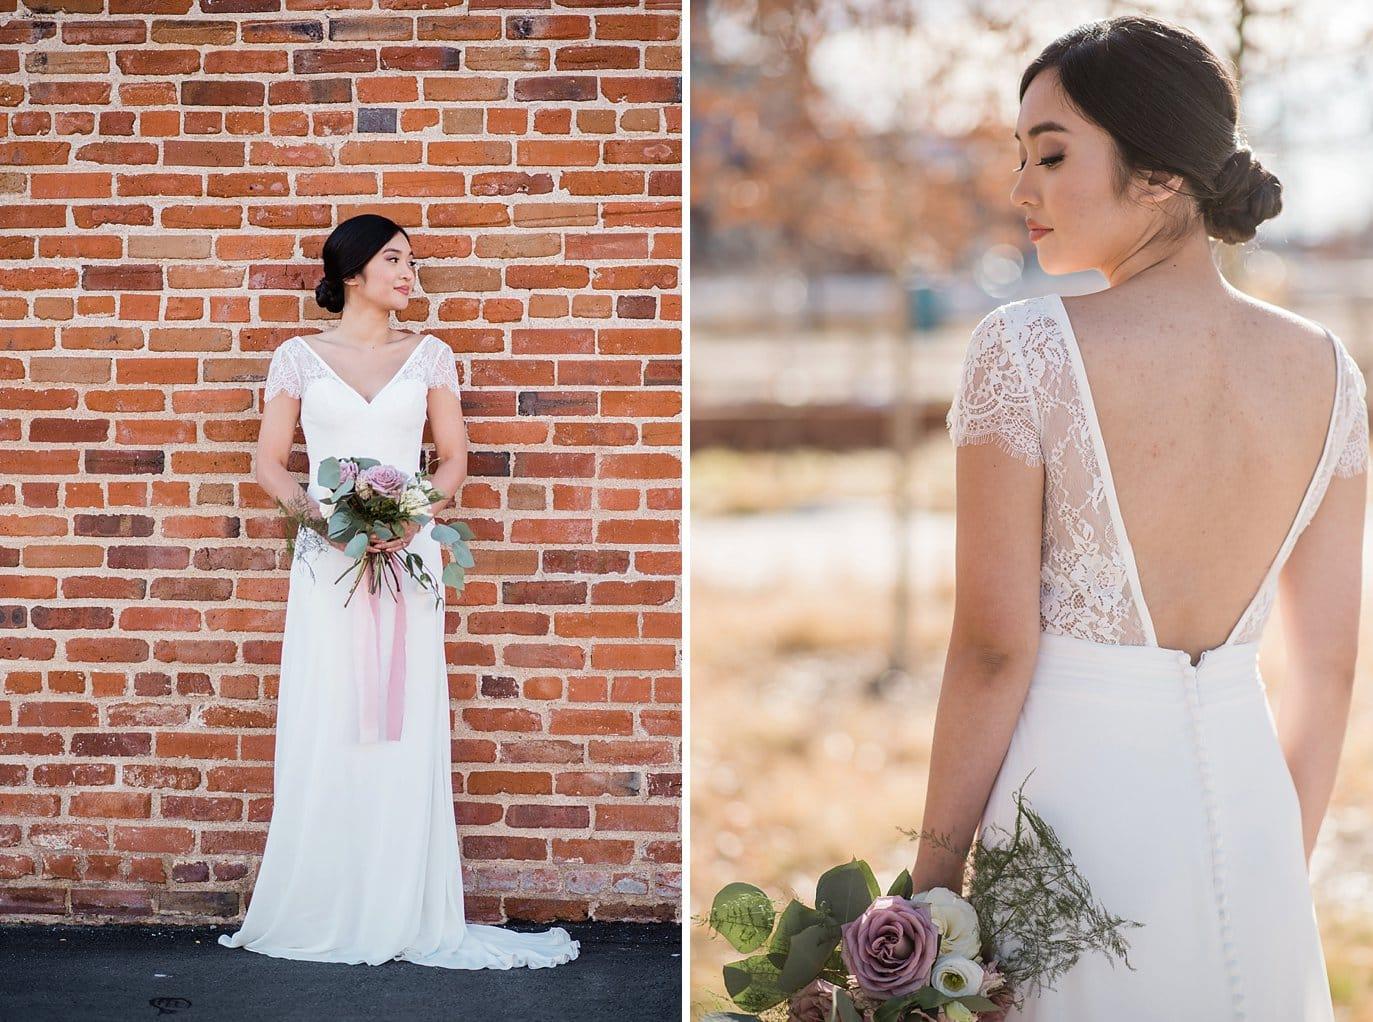 bride in sleek classy wedding dress with low plunging back wedding dress at Shyft Denver wedding by Boulder Wedding photographer Jennie Crate photographer